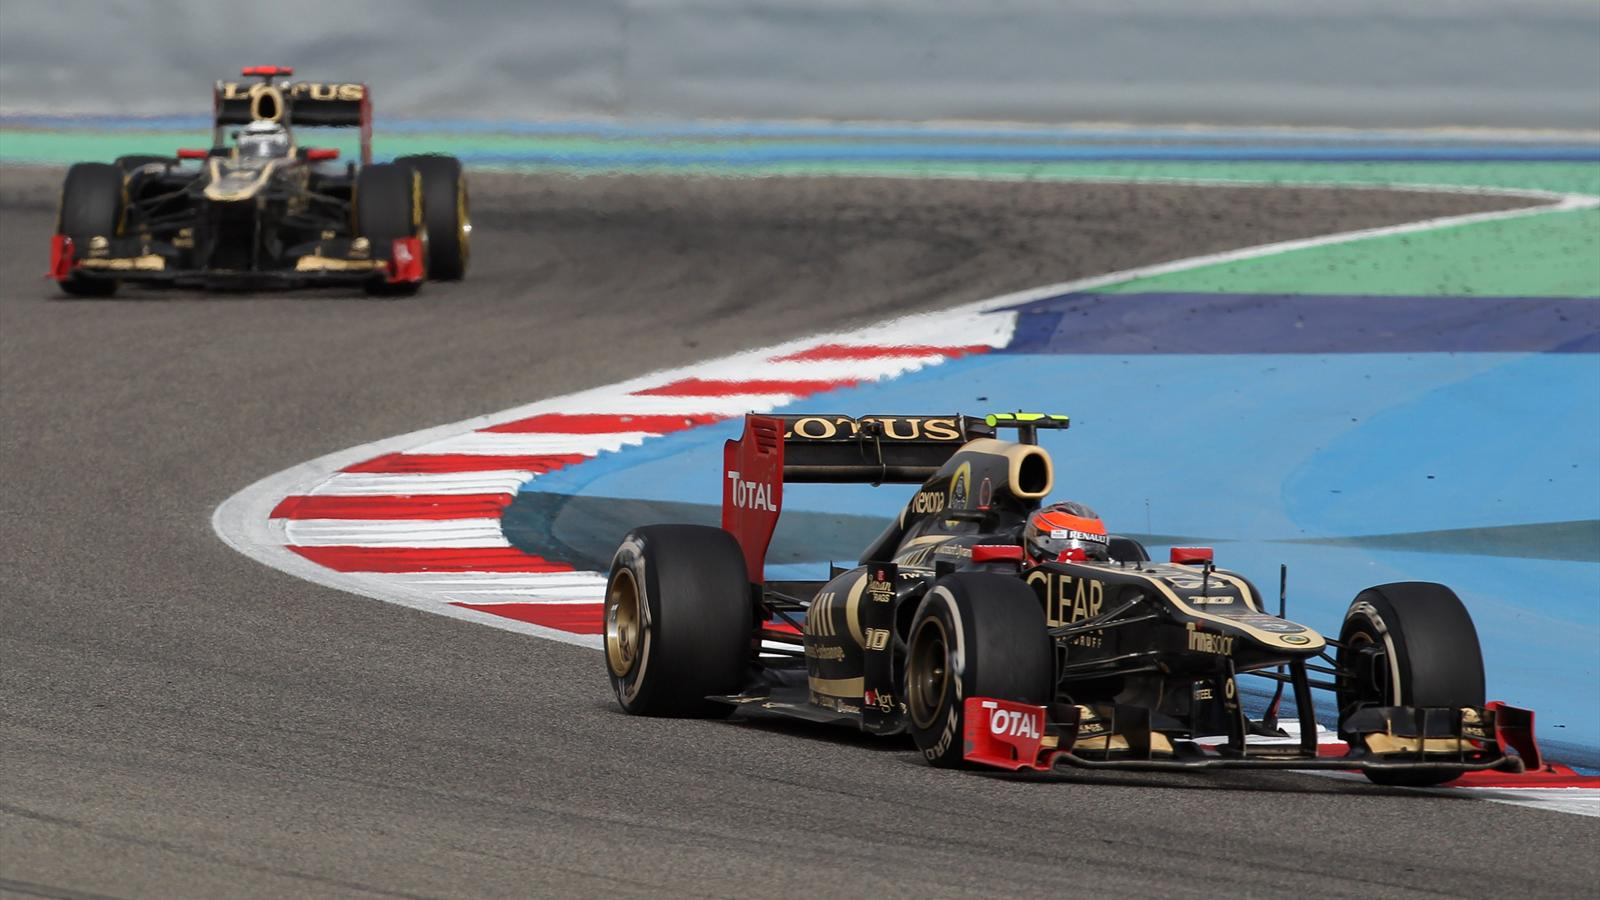 Lotus prend confiance grand prix de bahre n 2012 formule 1 eurosport - Formule vitesse de coupe ...